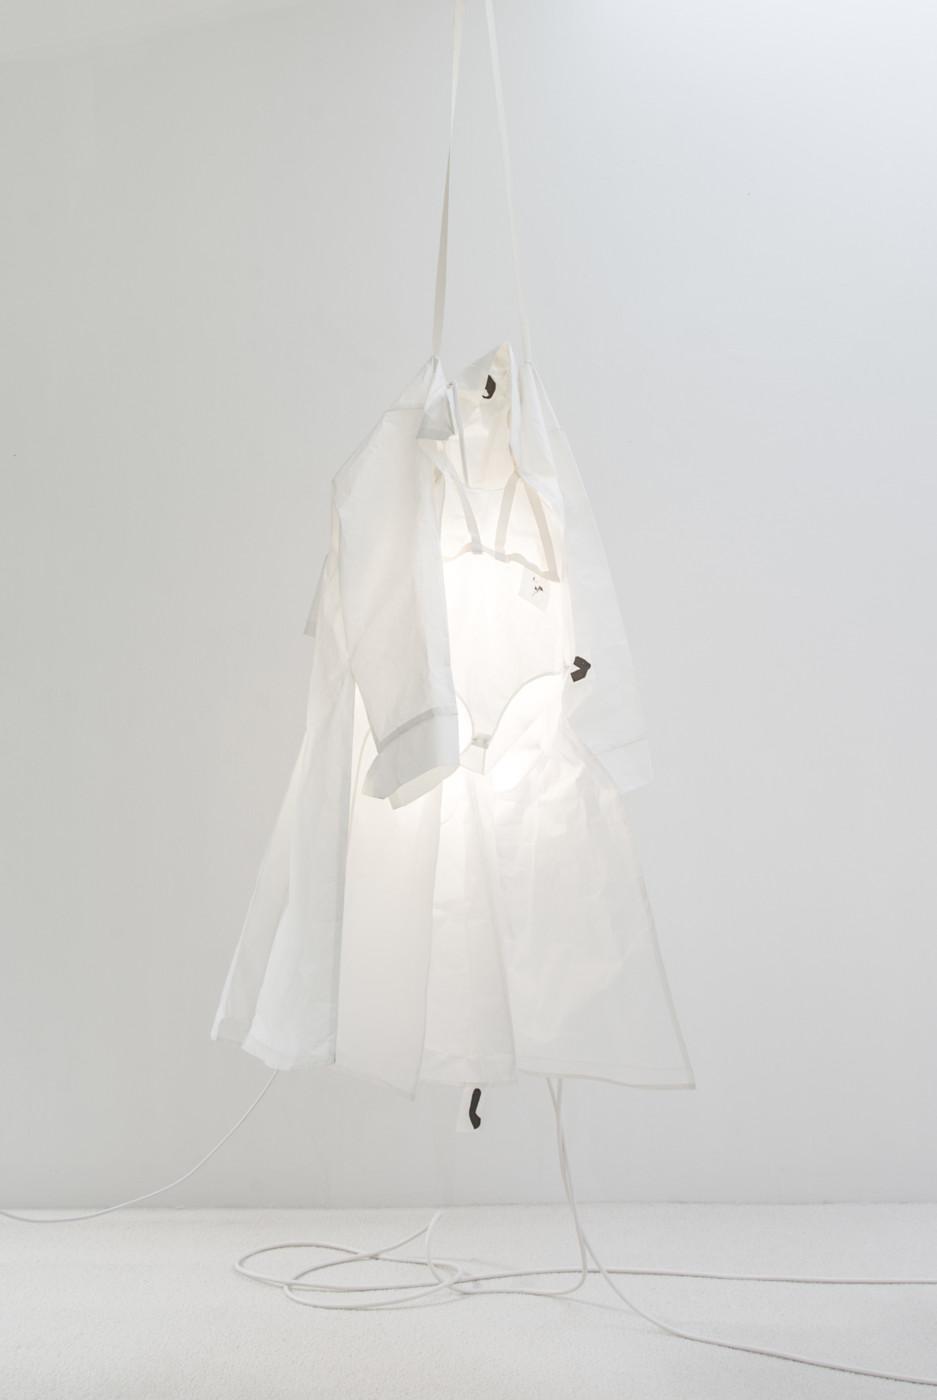 MÉLANIE MATRANGA  F-É-M-I-N-I-N , 2018 Japanese paper, mobile phone, wires 247 x 90 x 60 cm / 97.2 x 35.4 x 23.6 in - High Art Gallery Paris